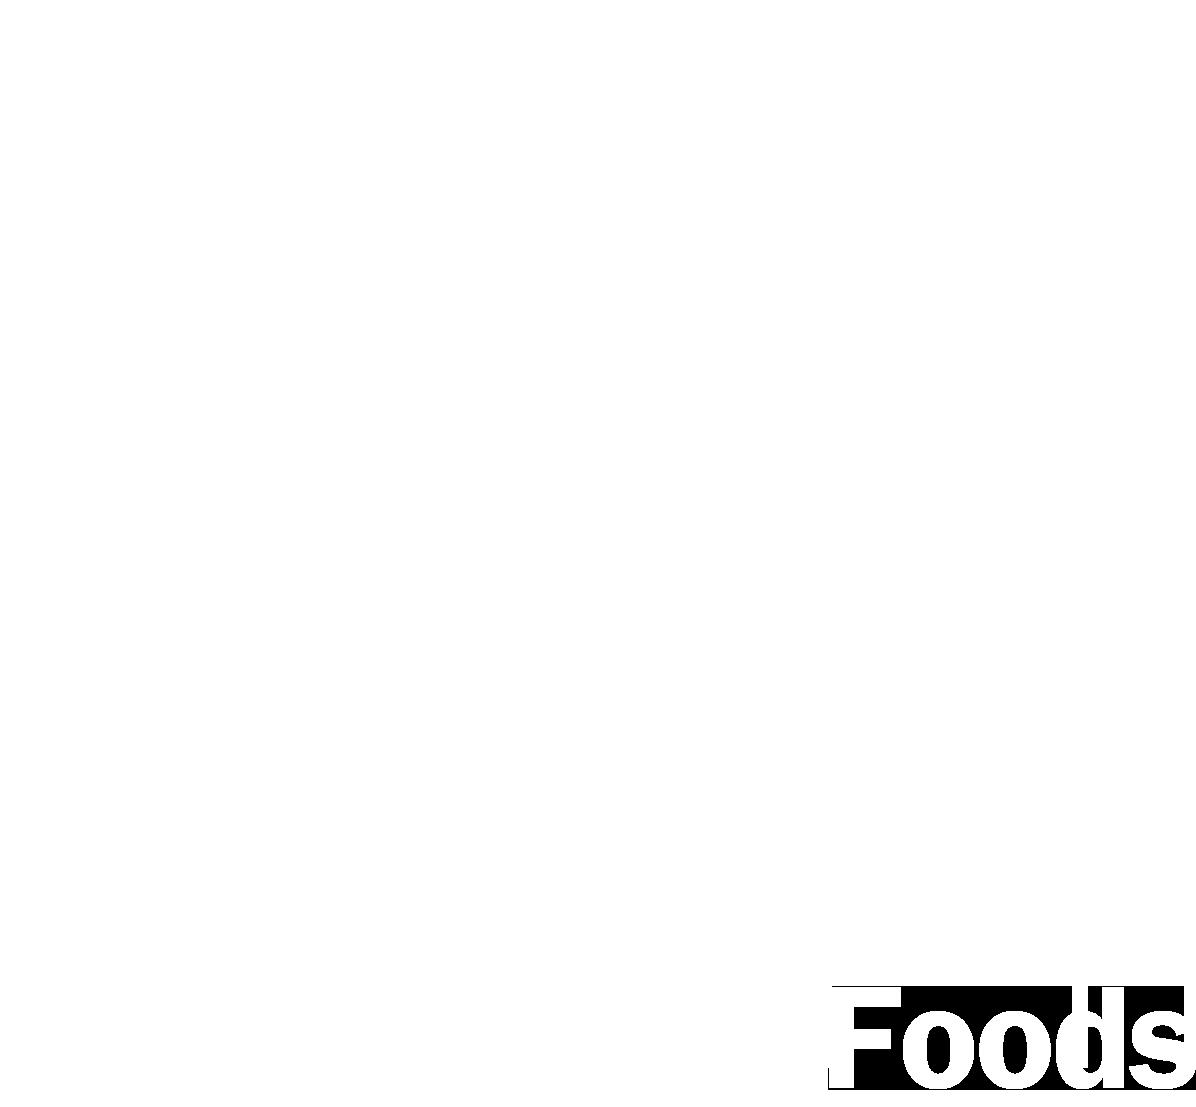 Rihanna Foods logo white